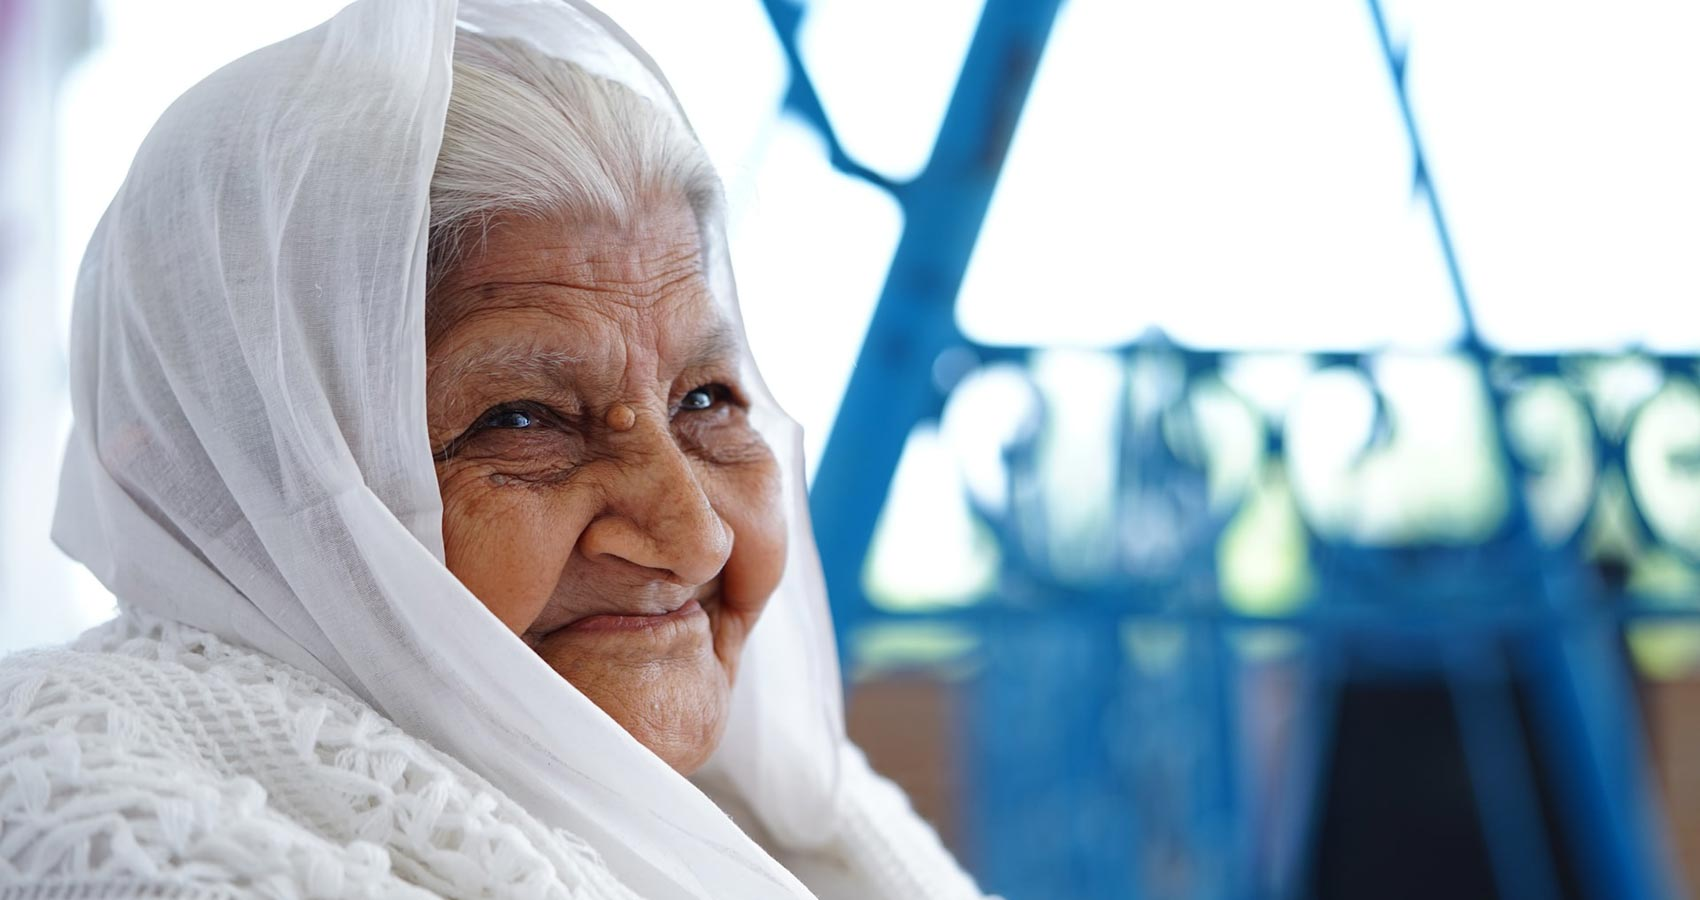 The Secret Smile, poetry written by Shruti Das at Spillwords.com